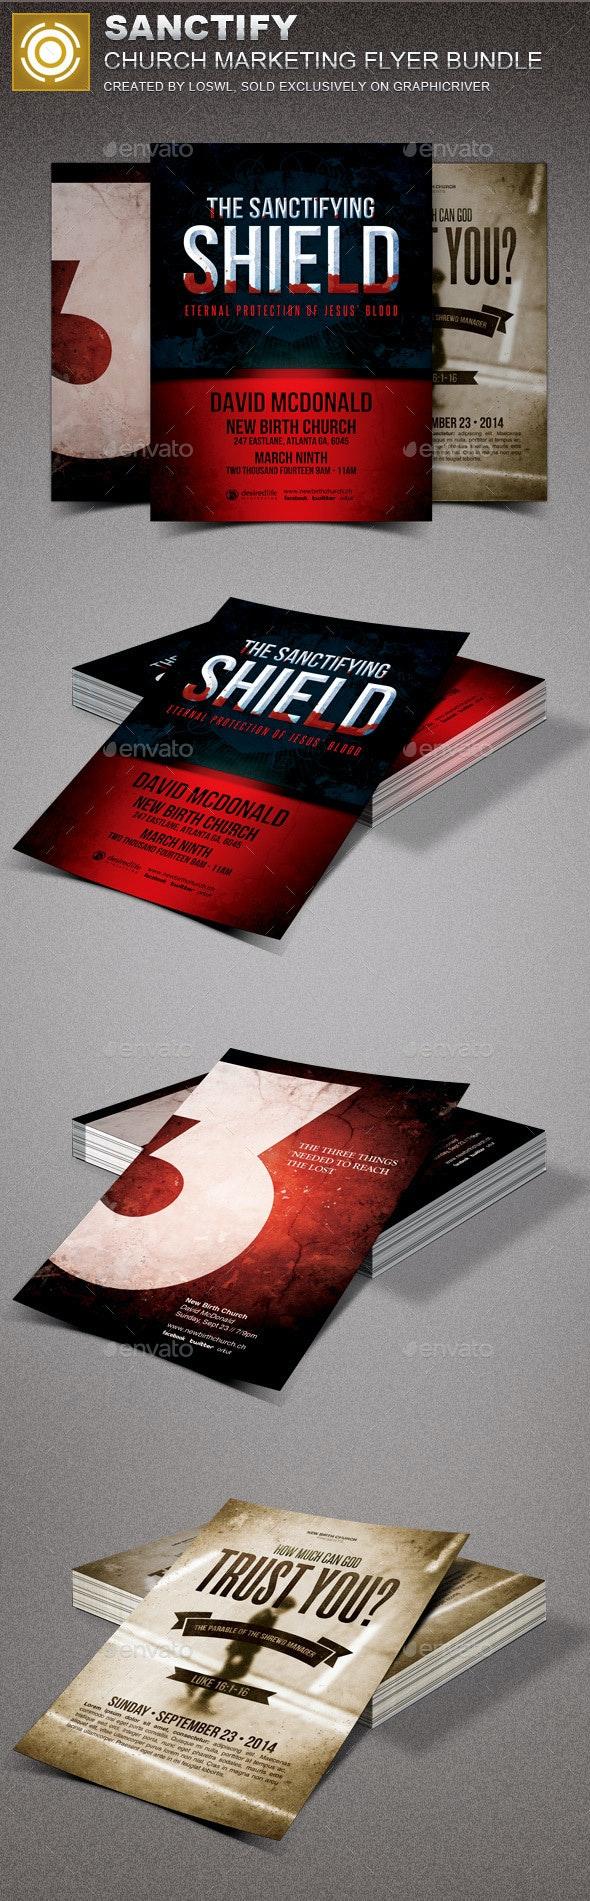 Sanctify Church Marketing Flyer Template Bundle - Church Flyers